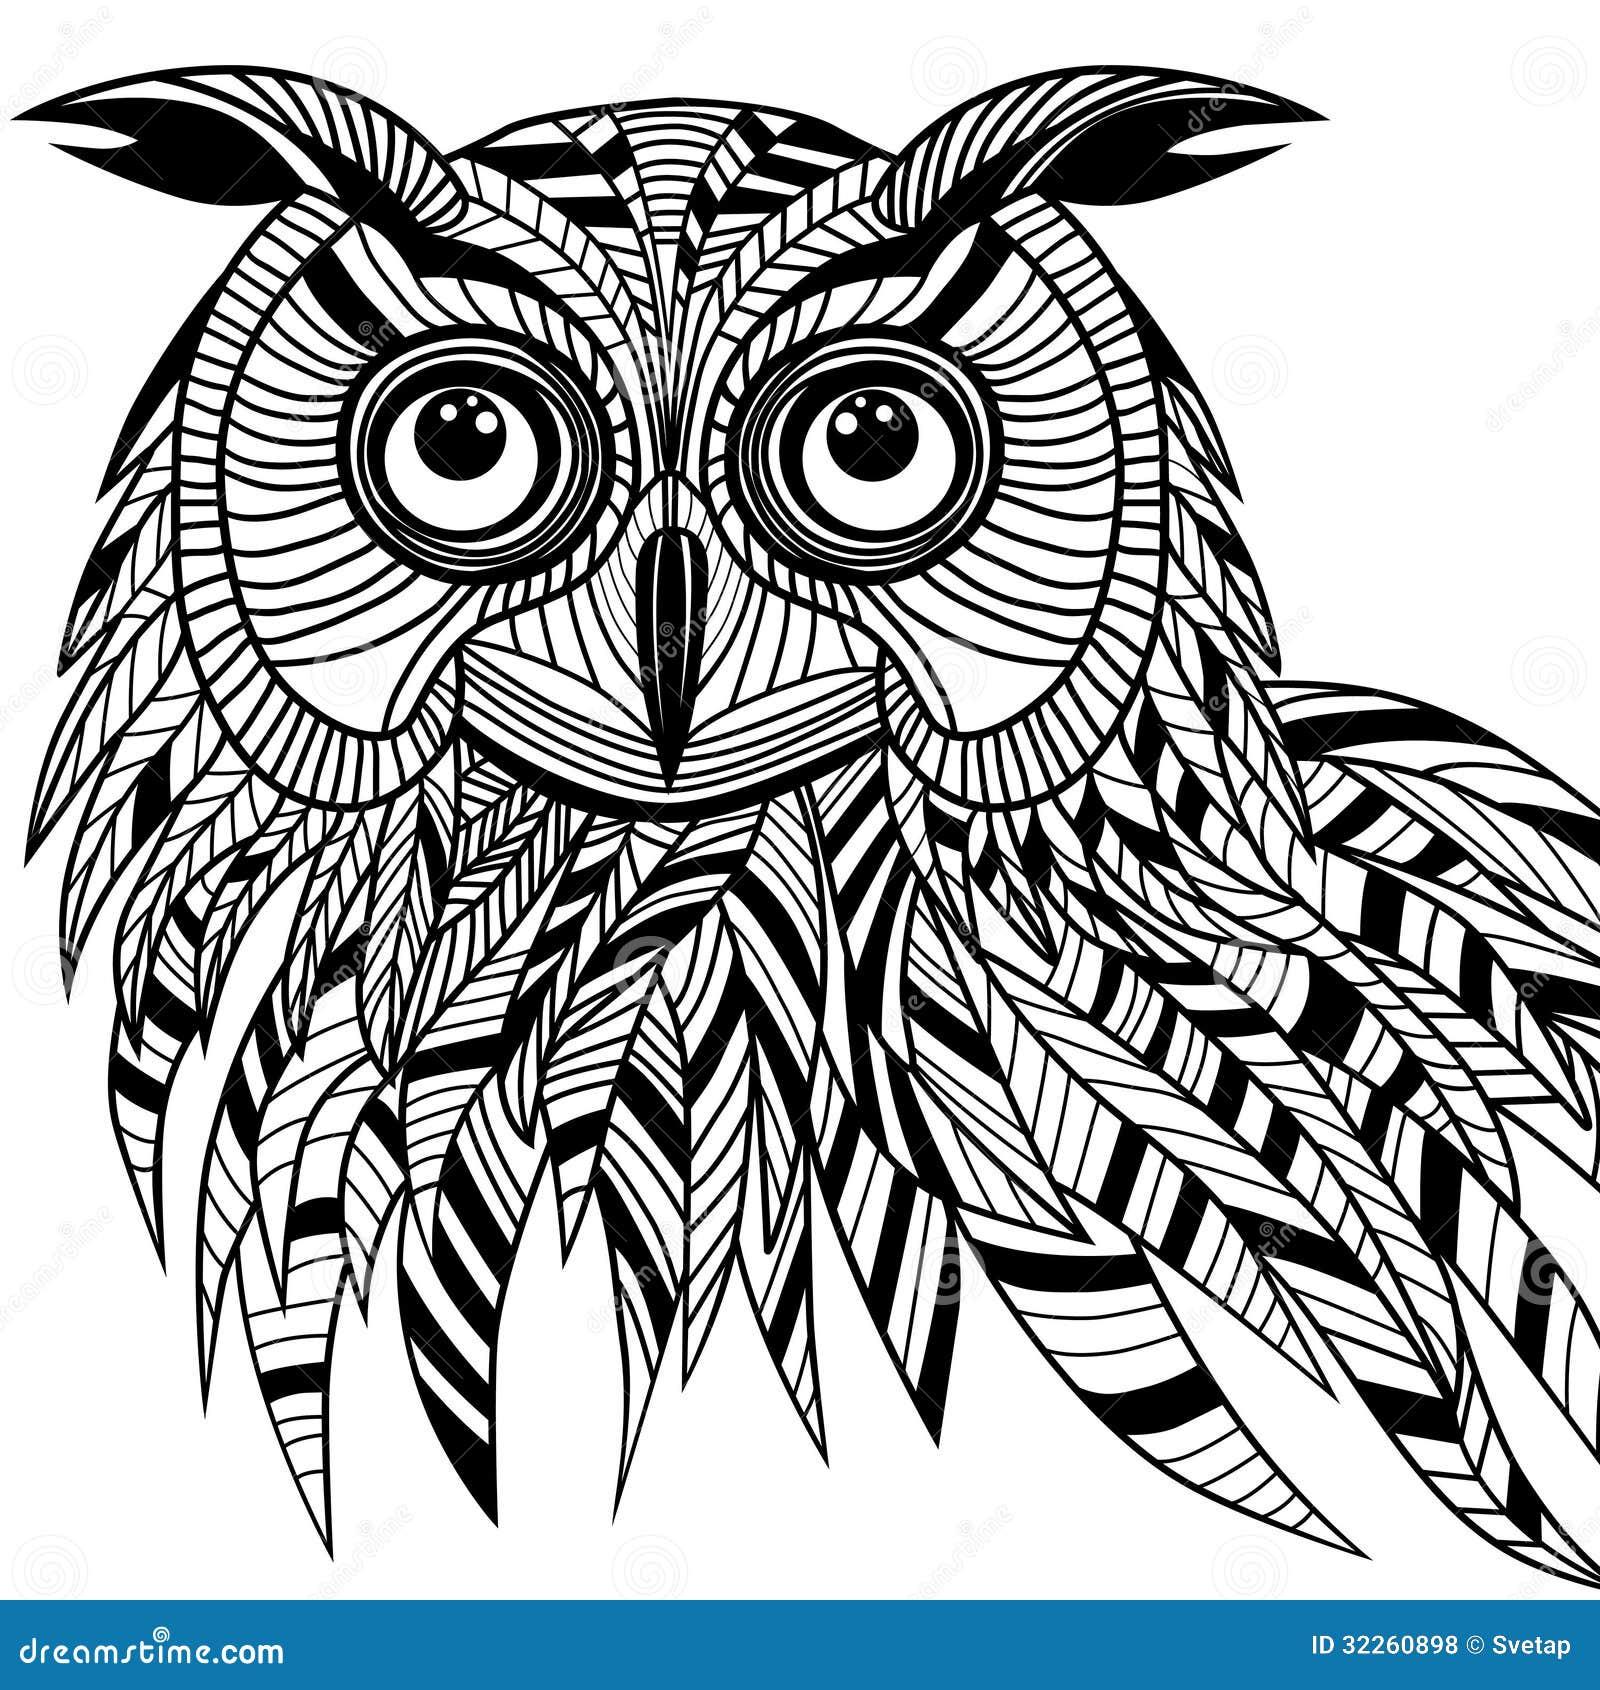 Design t shirt logo free - Owl Bird Head As Halloween Symbol For Mascot Or Emblem Design S Royalty Free Stock